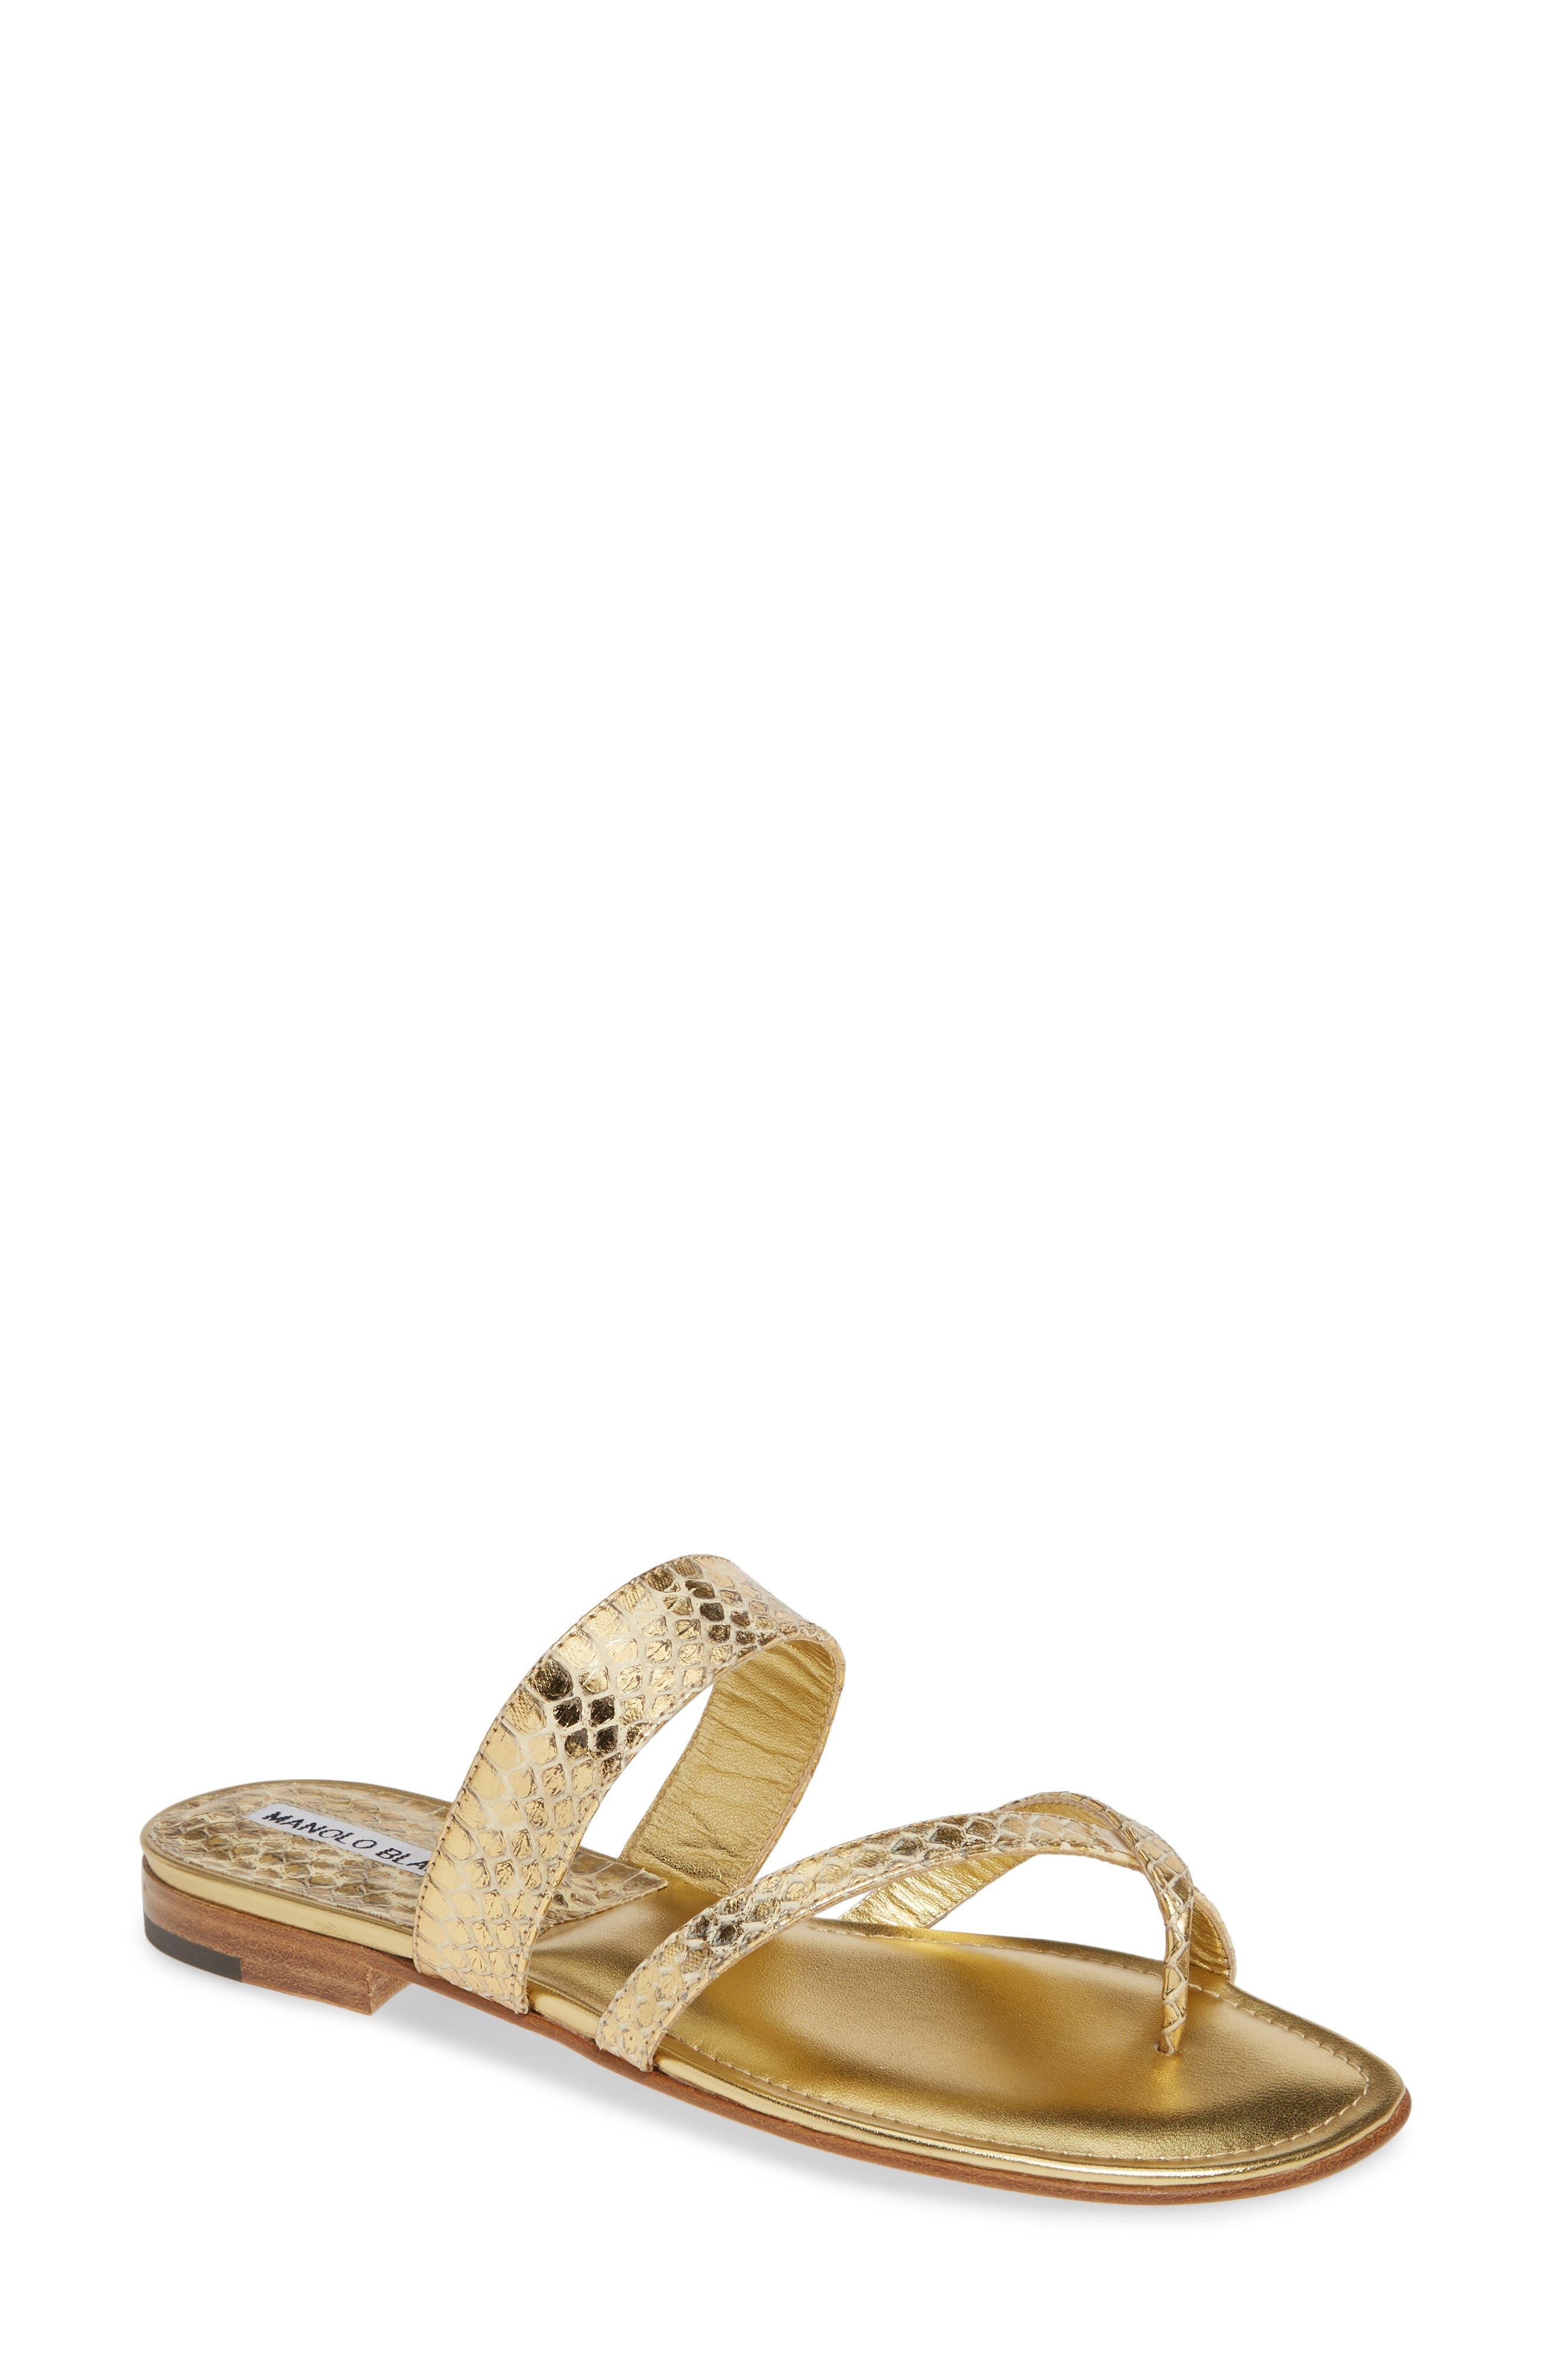 MANOLO BLAHNIK,                             'Susa' Genuine Snakeskin Sandal,                             Main thumbnail 1, color,                             GOLD WATERSNAKE